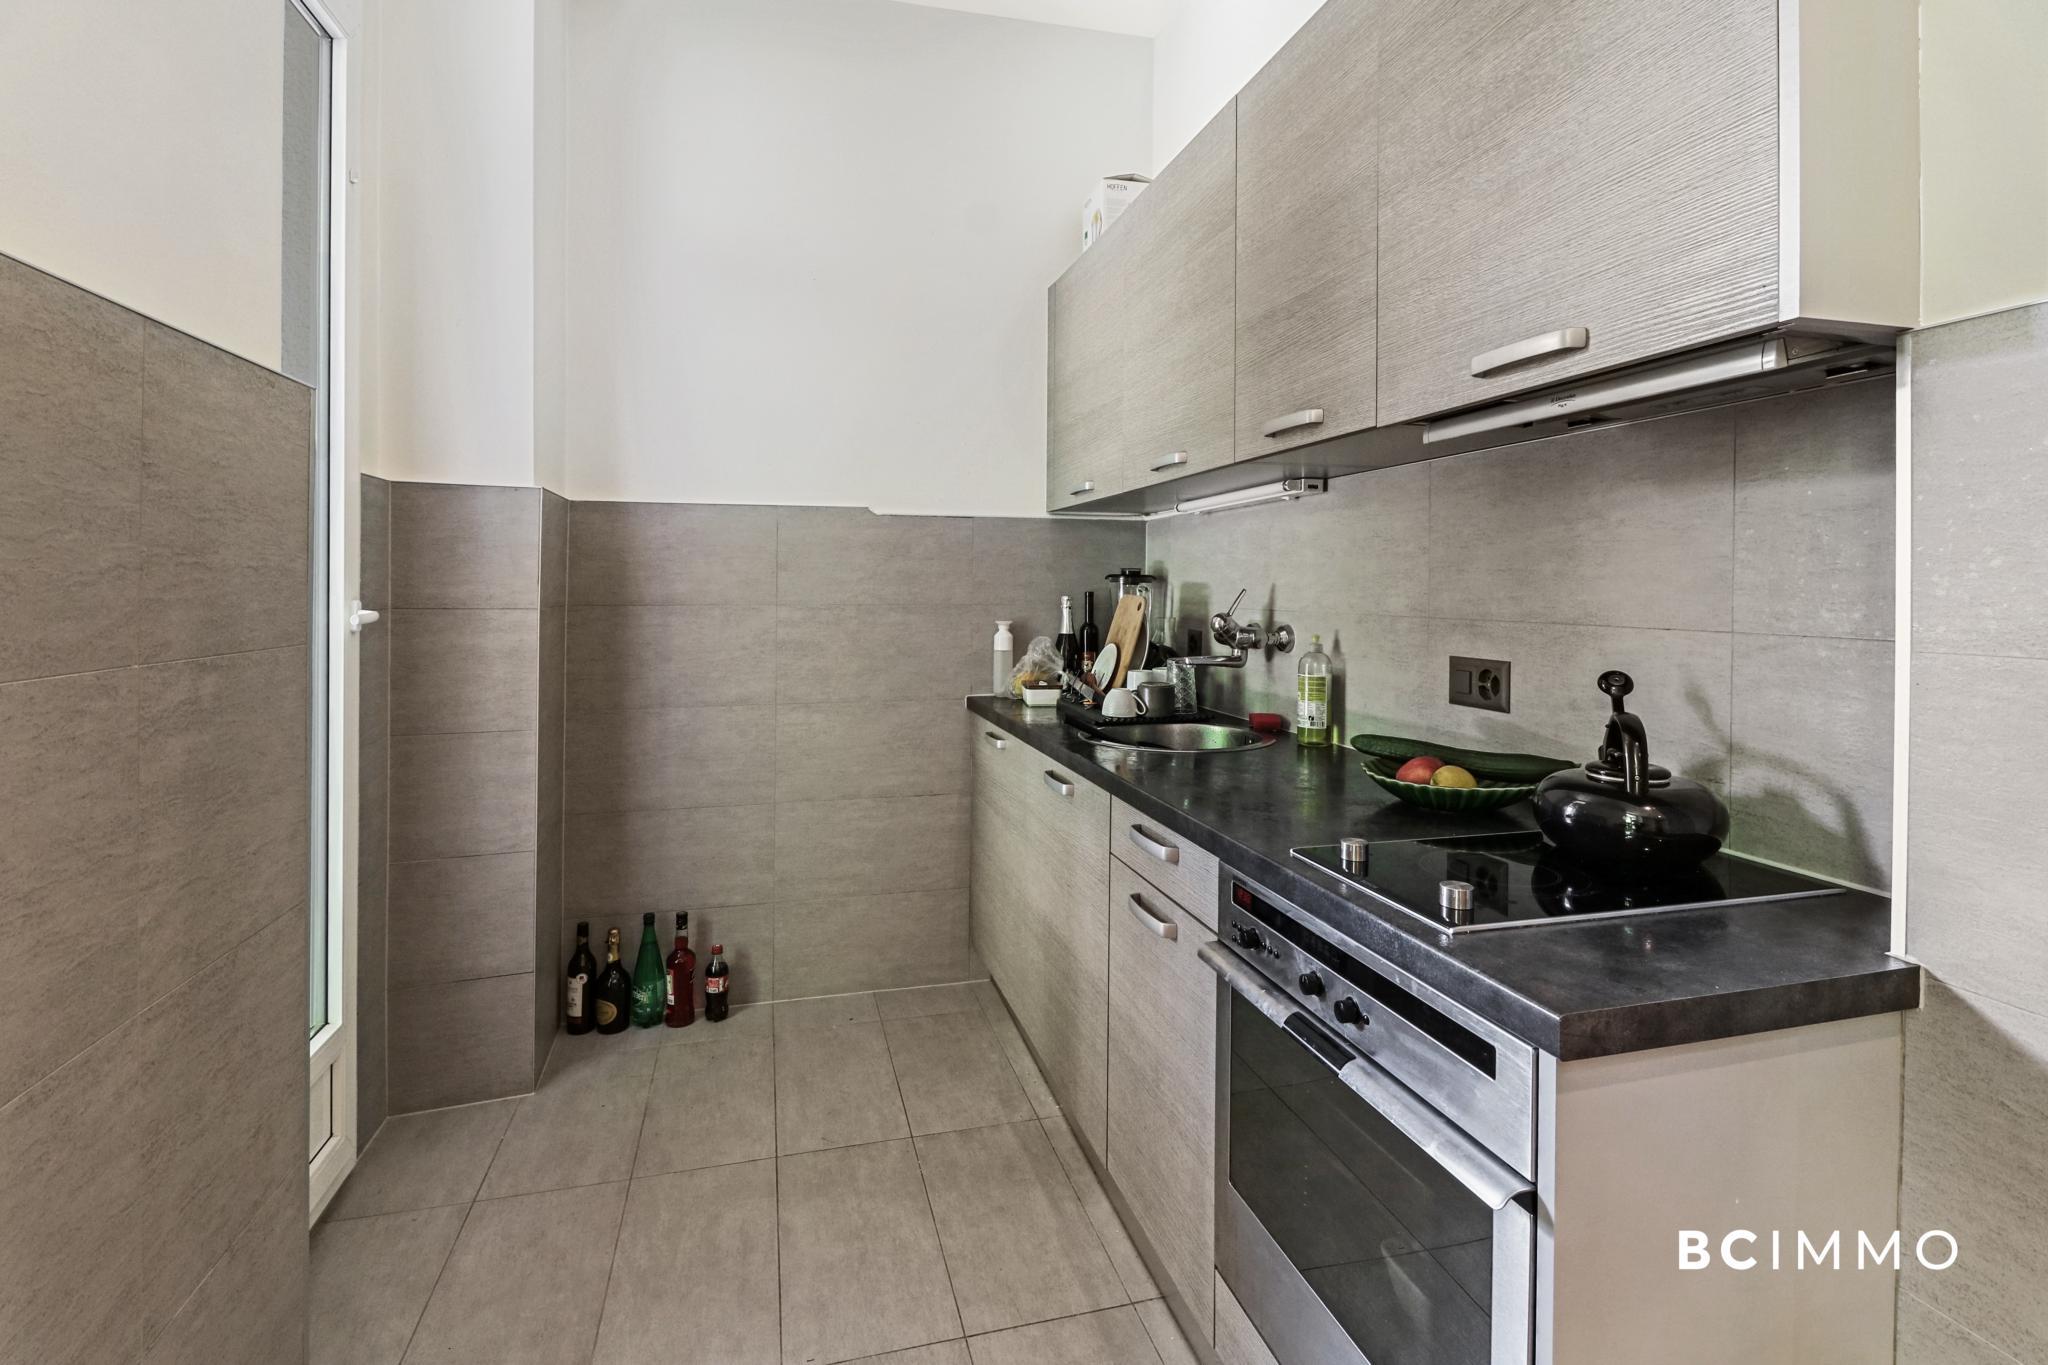 BC Immo - Situation exceptionnelle - Appartements pour investisseur - 1005HB03